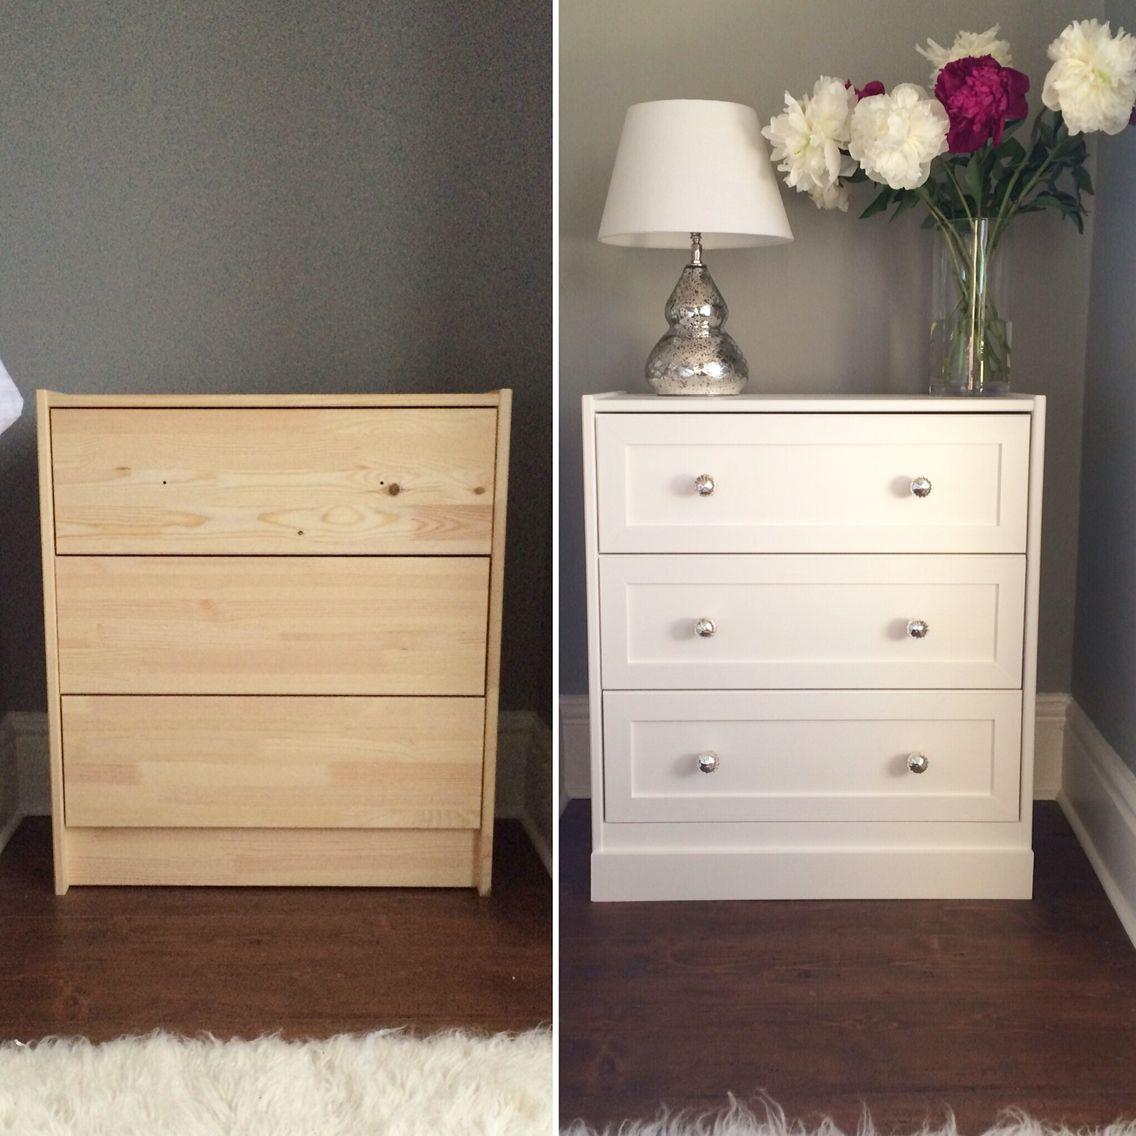 Ikea Rast Hack Bedside Table Diy Farrow And Ball White Company Furniture Makeover Furniture Hacks Ikea Diy